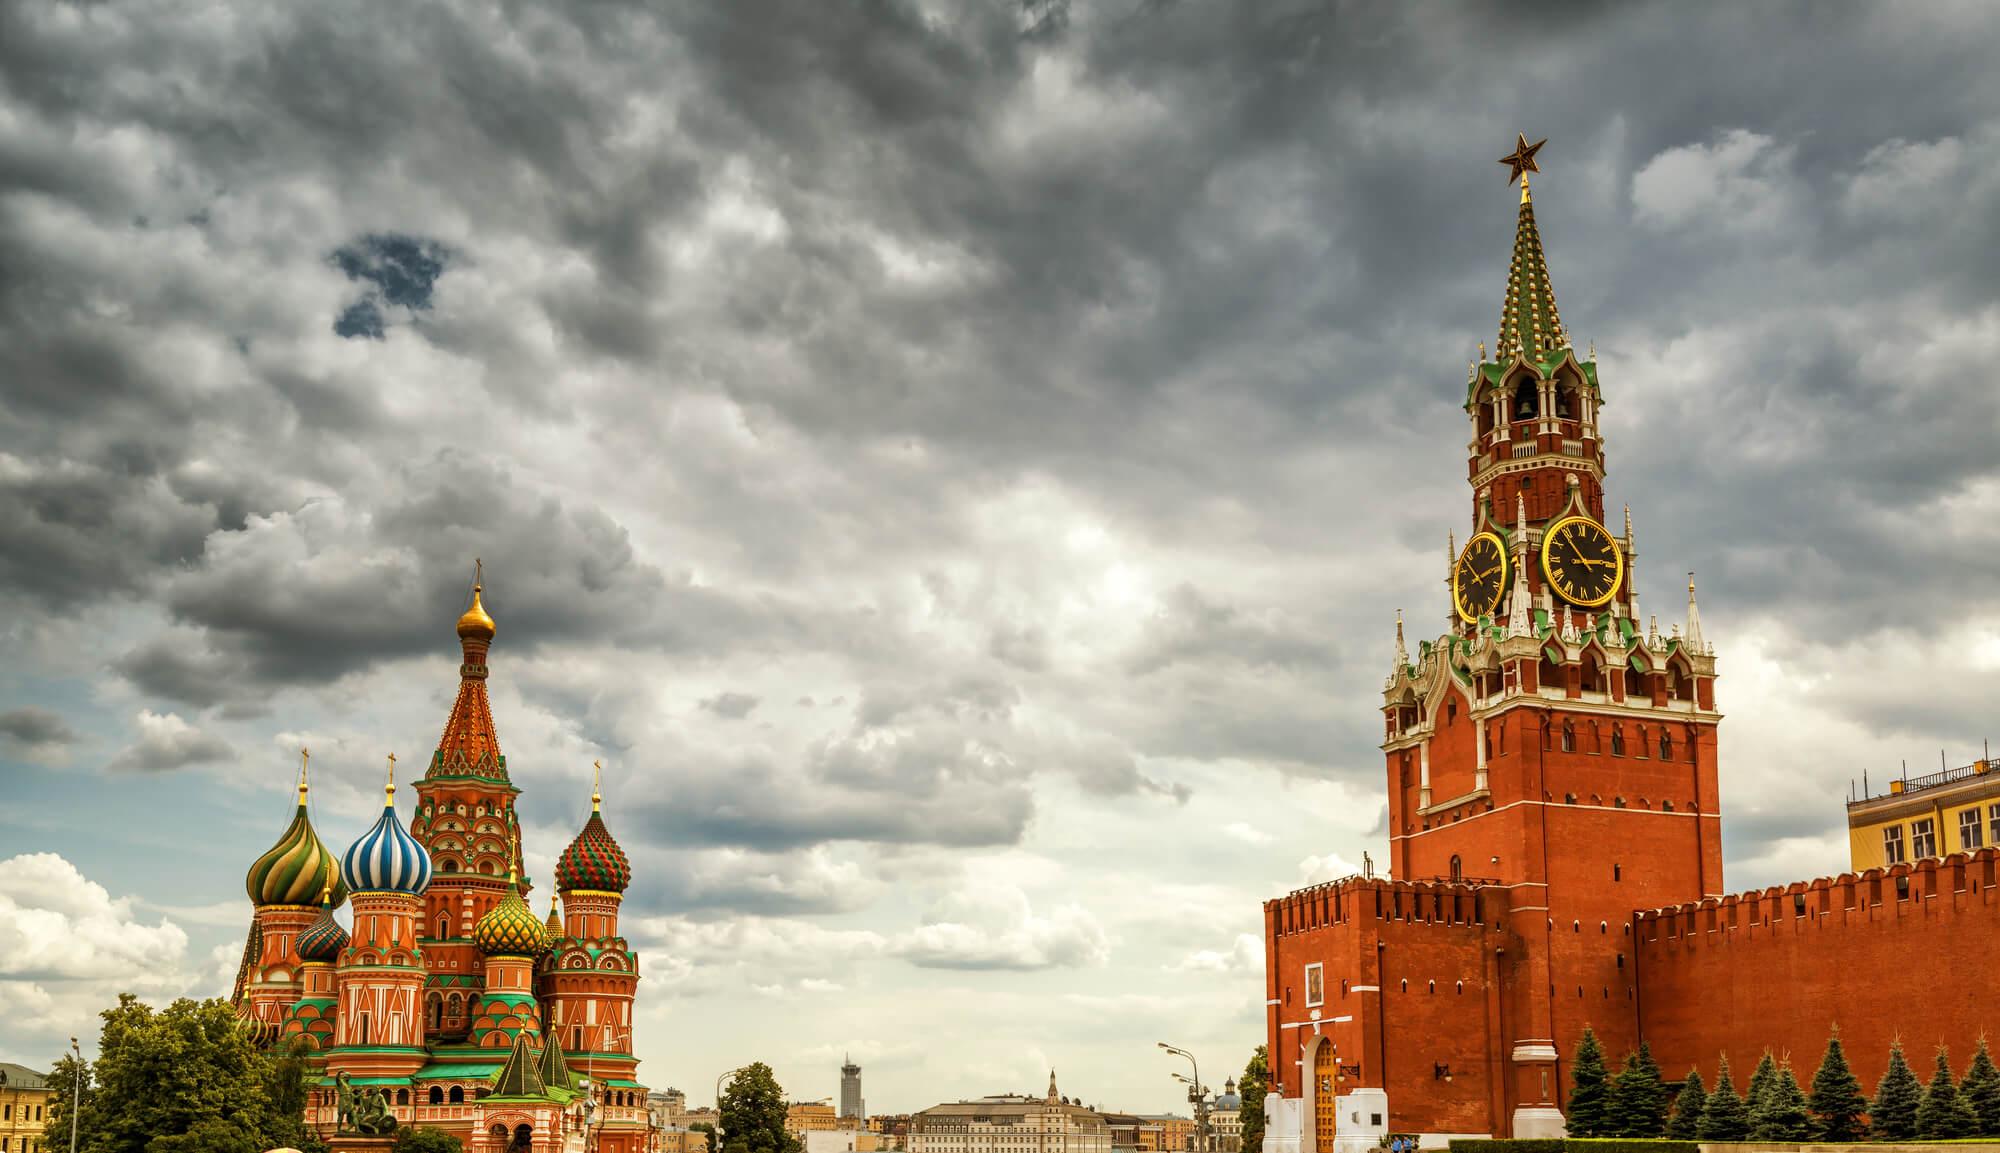 On the Historical Unity of Lies and Vladimir Putin